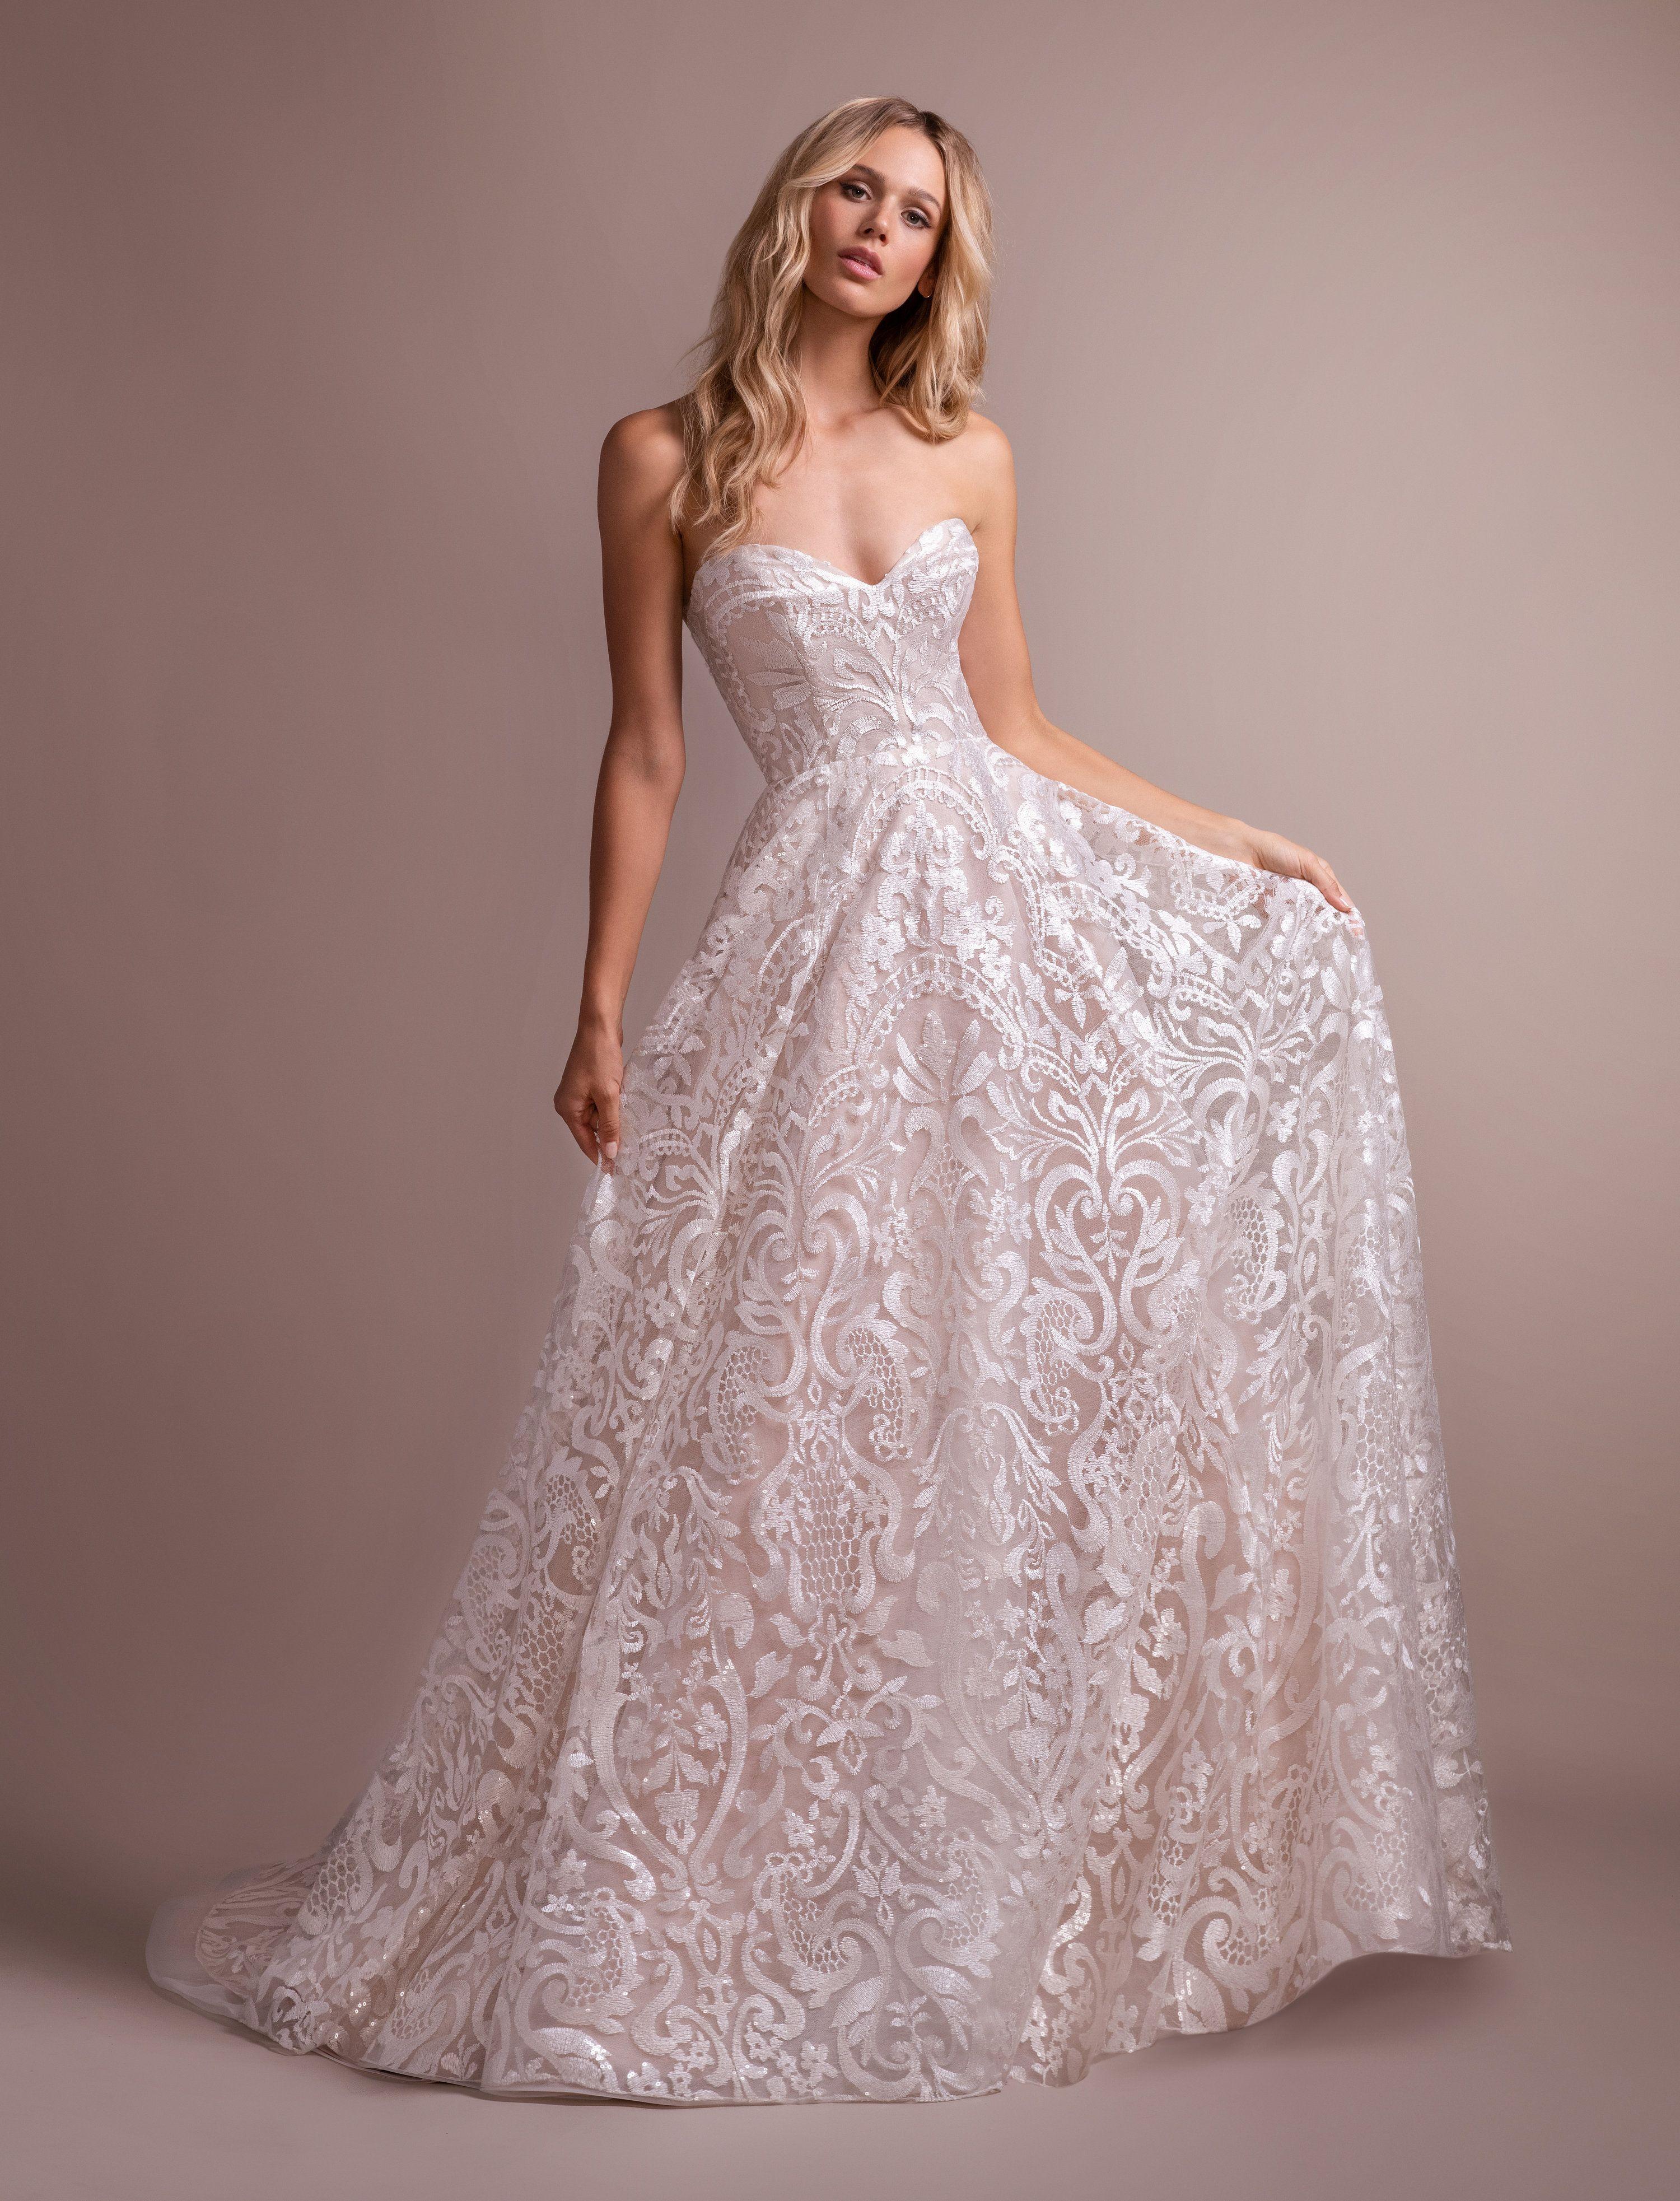 Hpmarsden Ivory Luxembourg Long Sleeve Ball Gown Sweetheart